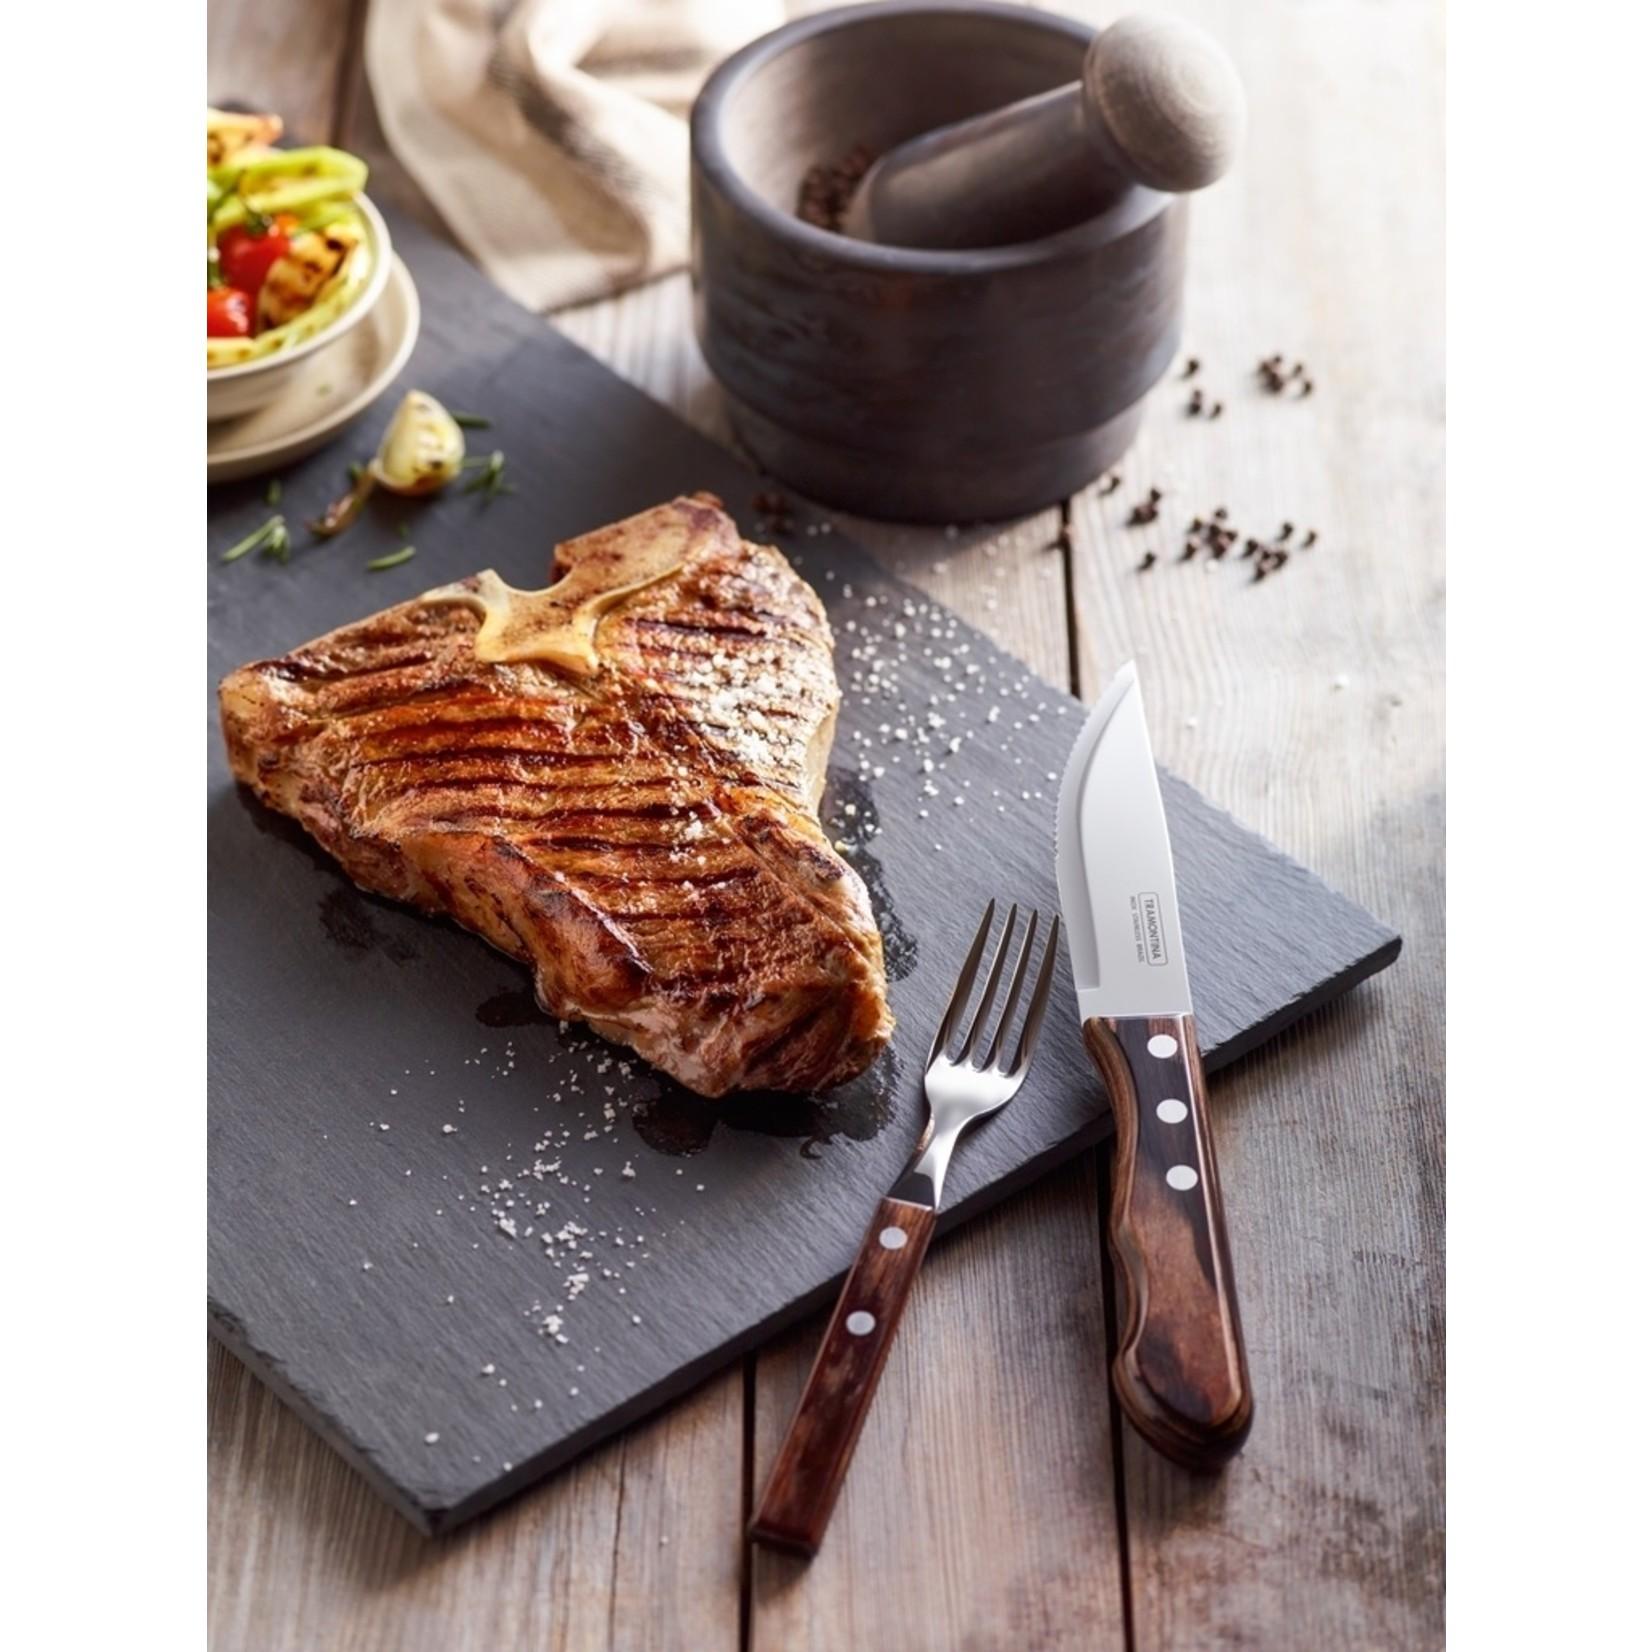 Tramontina Tramontina Churrasco steakmessenset Jumbo 4-delig bruin